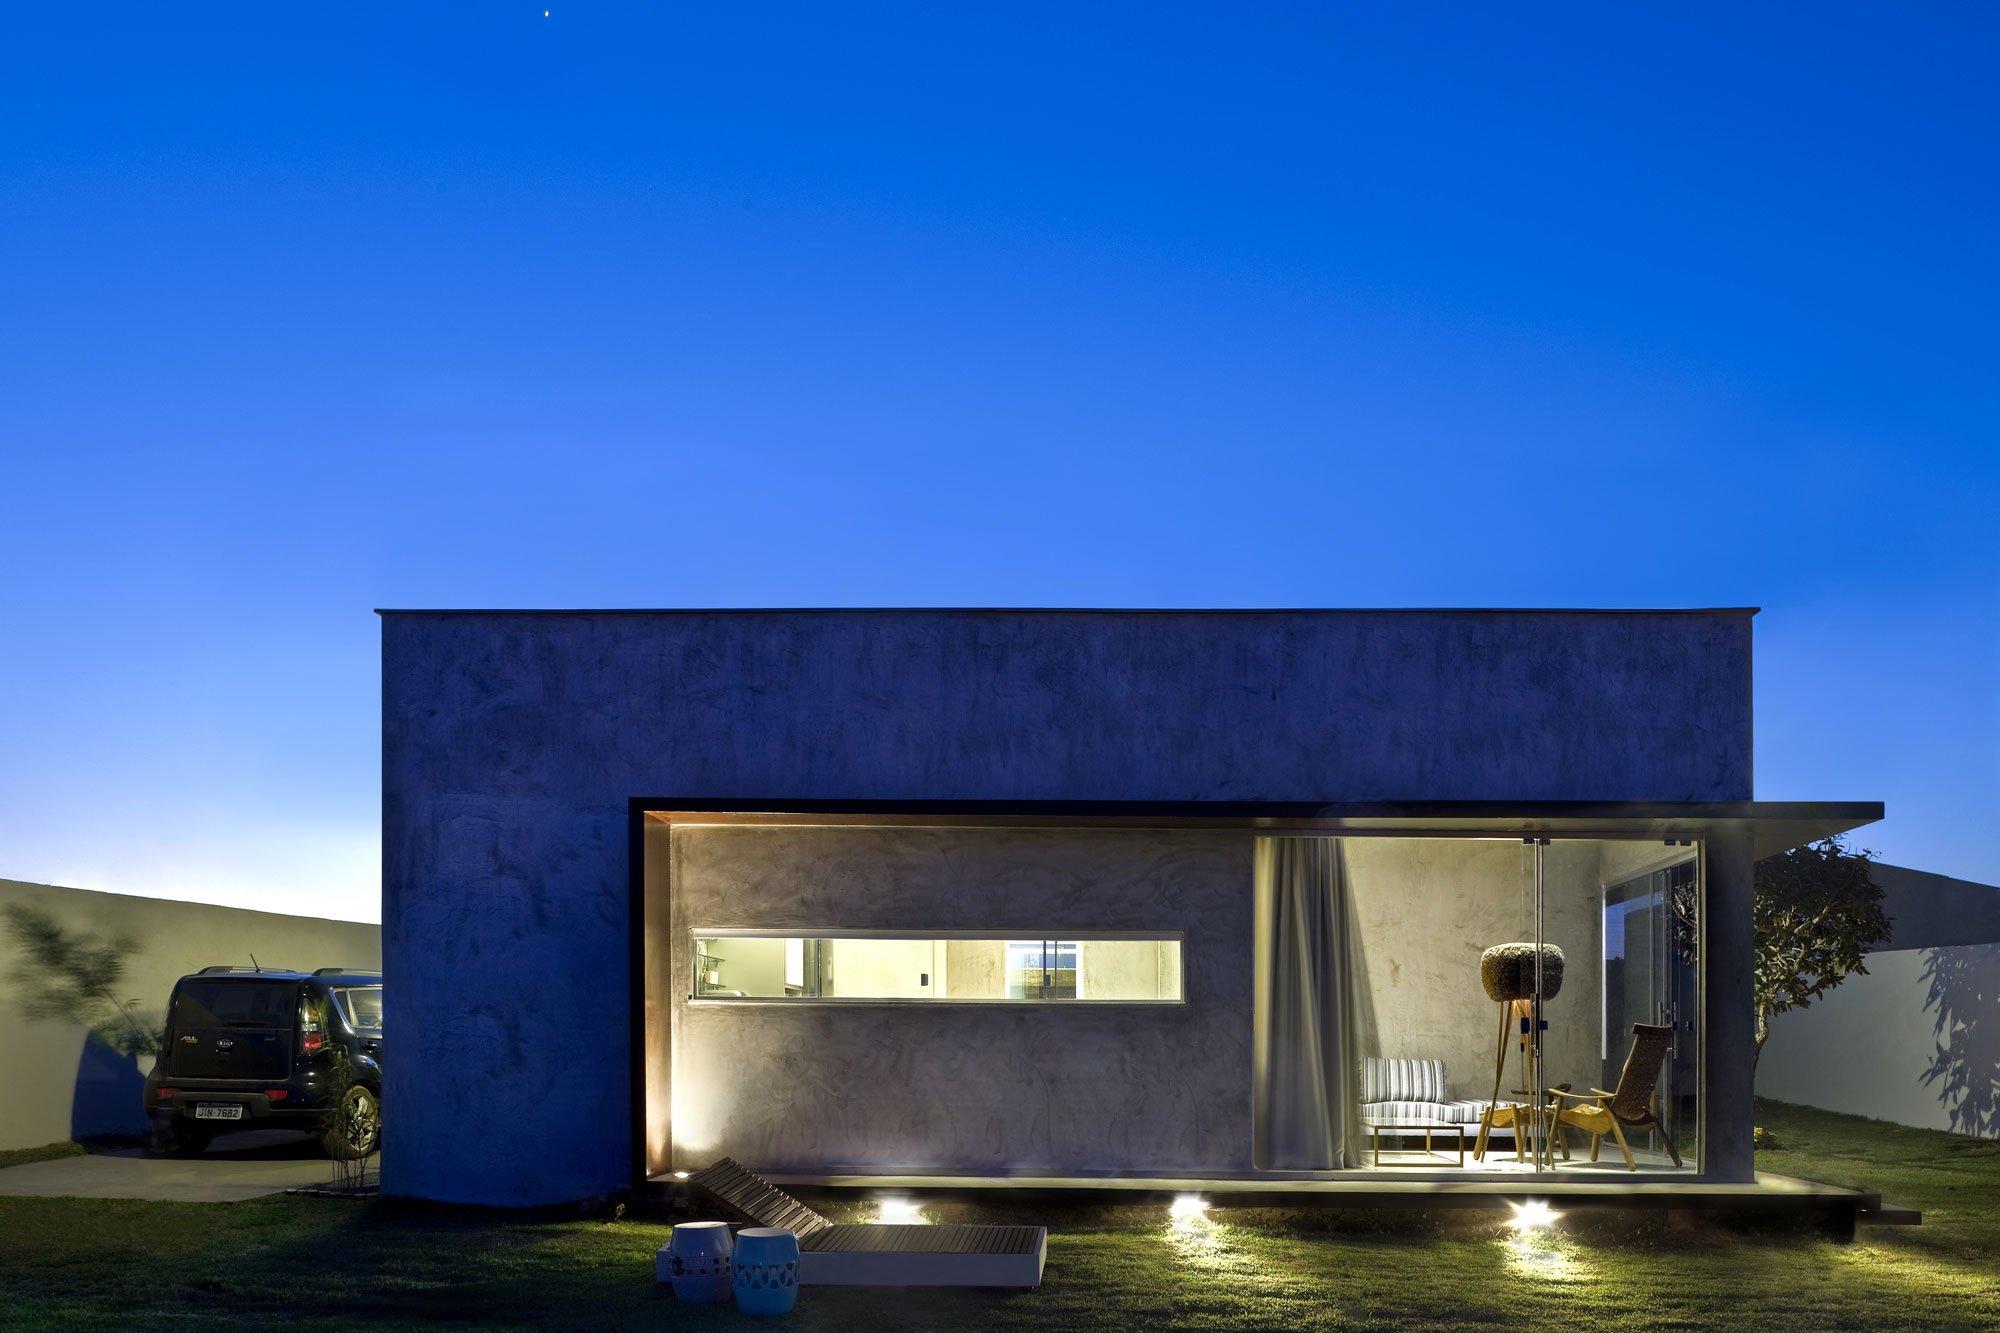 Box House By 1 1 Arquitetura Design Caandesign